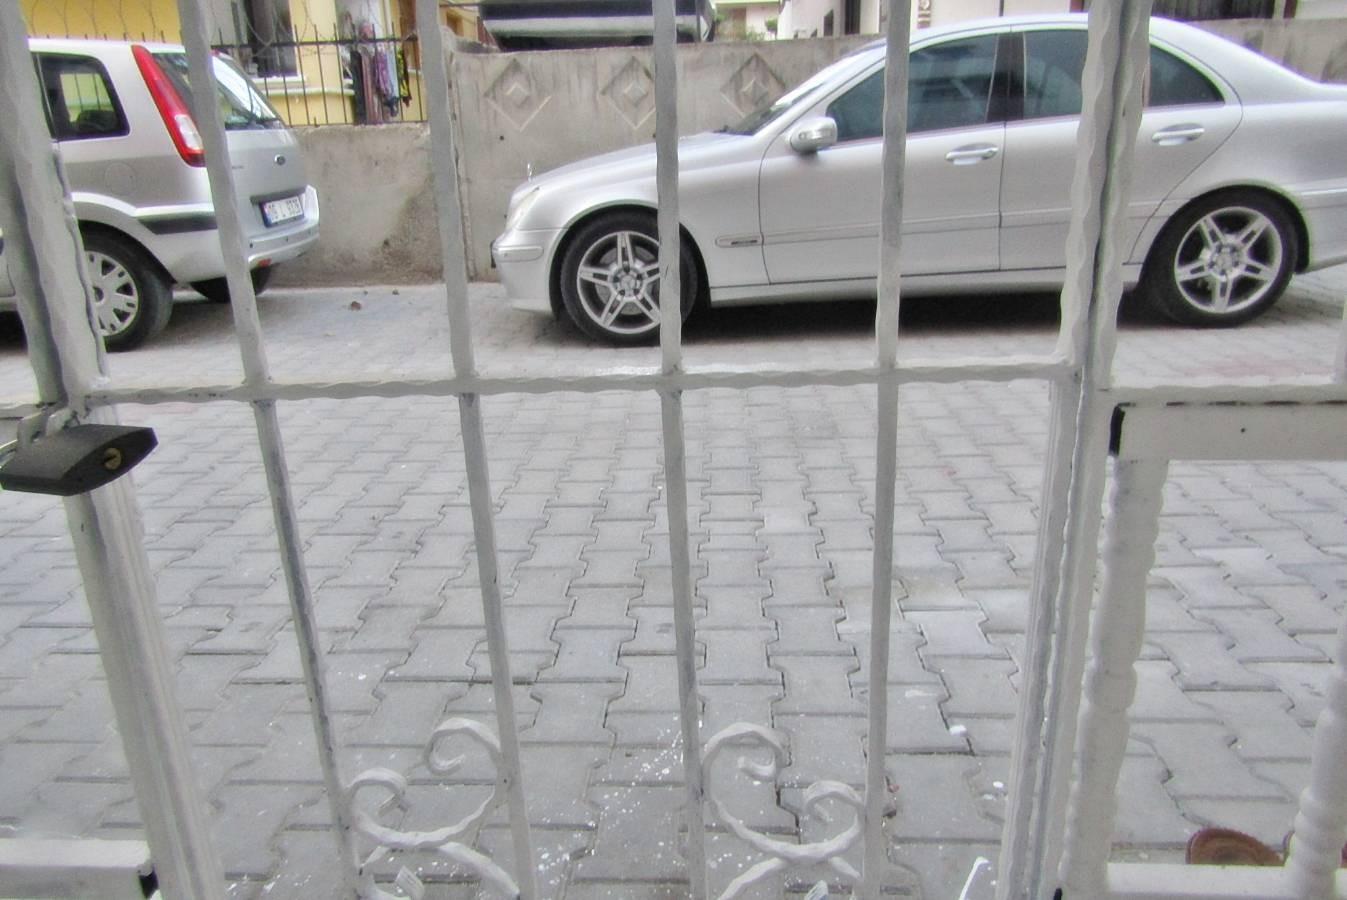 SR EMLAK'TAN PİYADE MAH'DE 3+1 120m² MASRAFSIZ YAPILI DAİRE